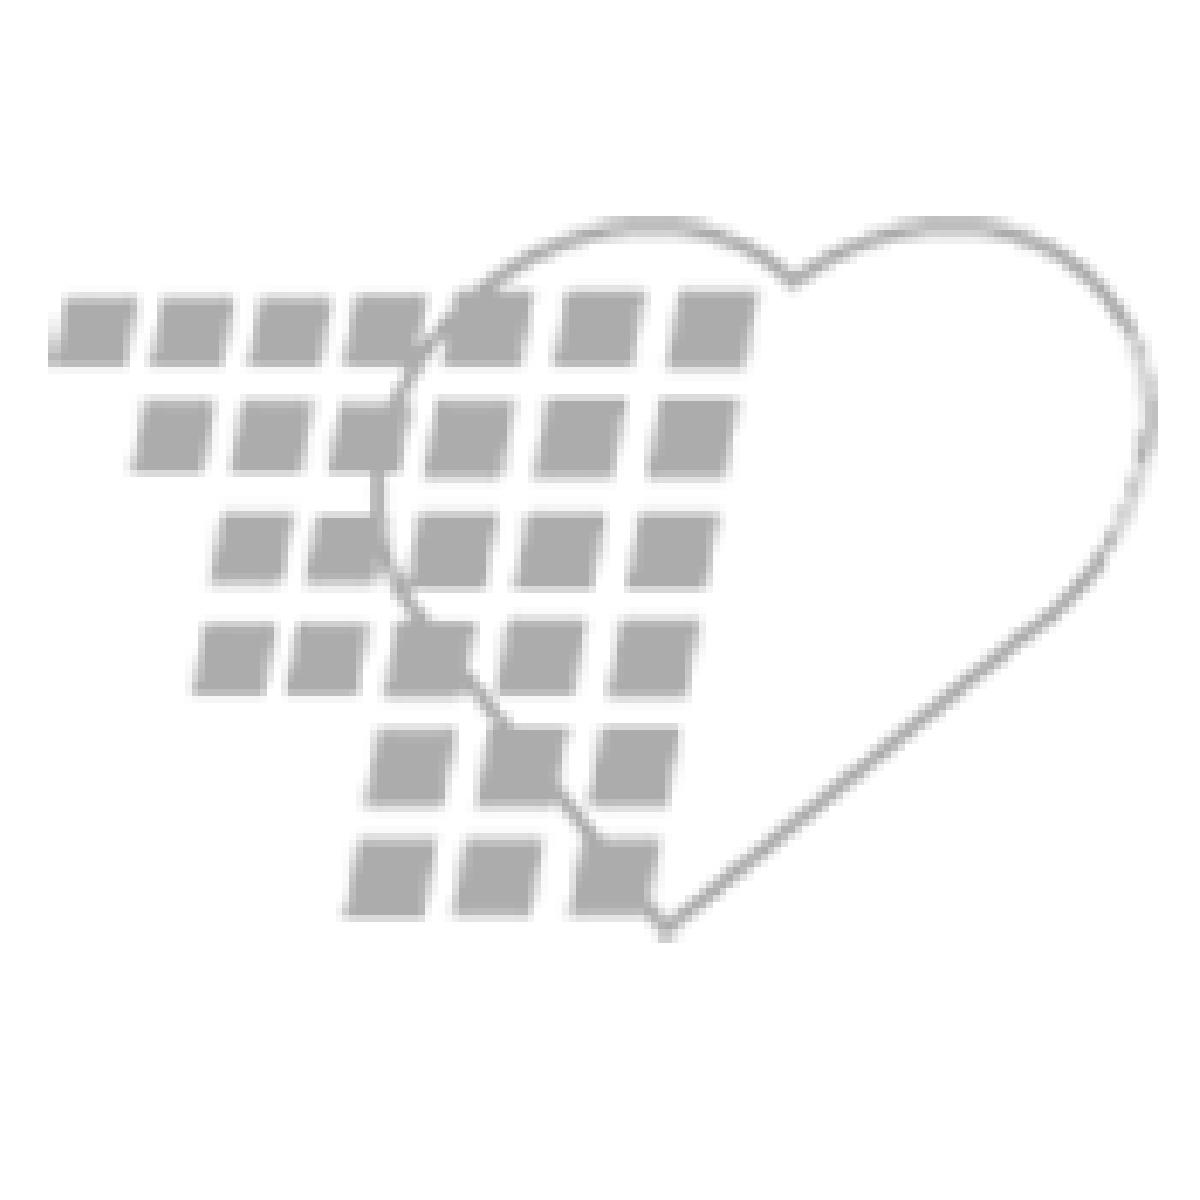 06-11-1115 Pocket Nurse® Needles Only - Non Safety Bundle